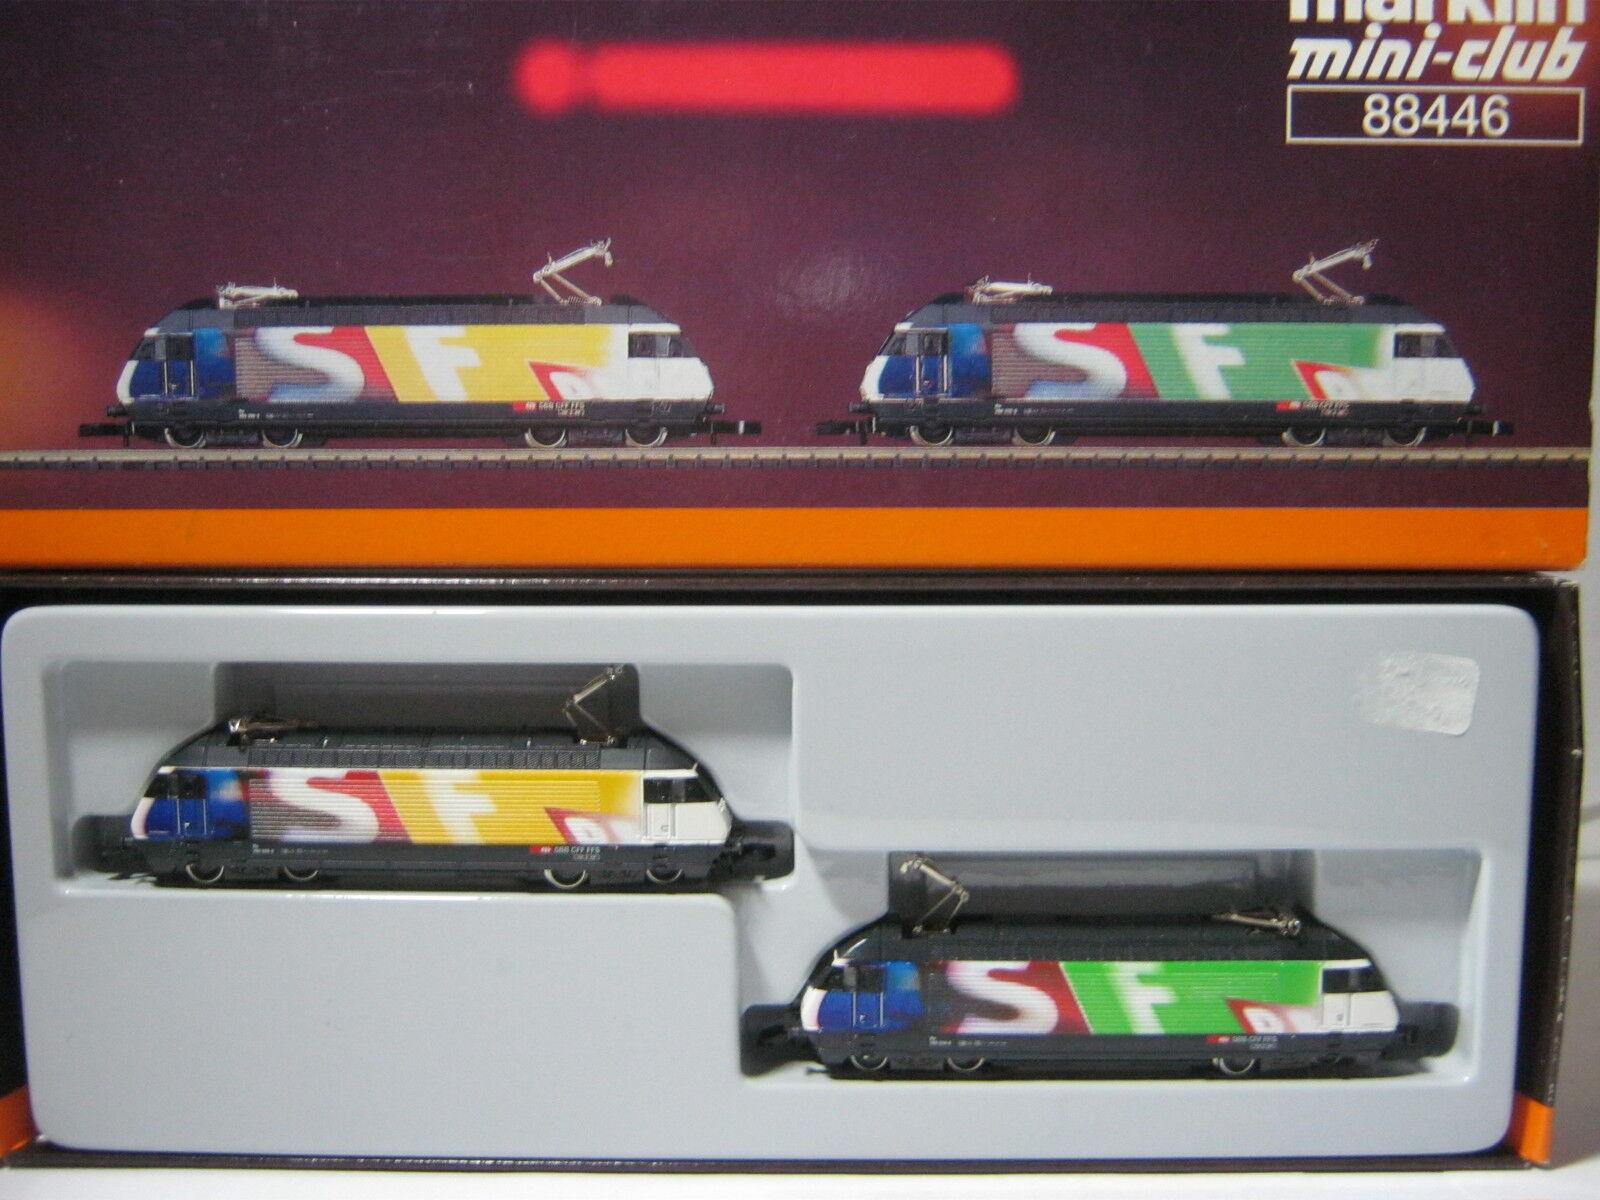 Mini Club Z 88446 E-Locomotiva BR 460 -056-5/032-6 SBB  rg/av/100s4